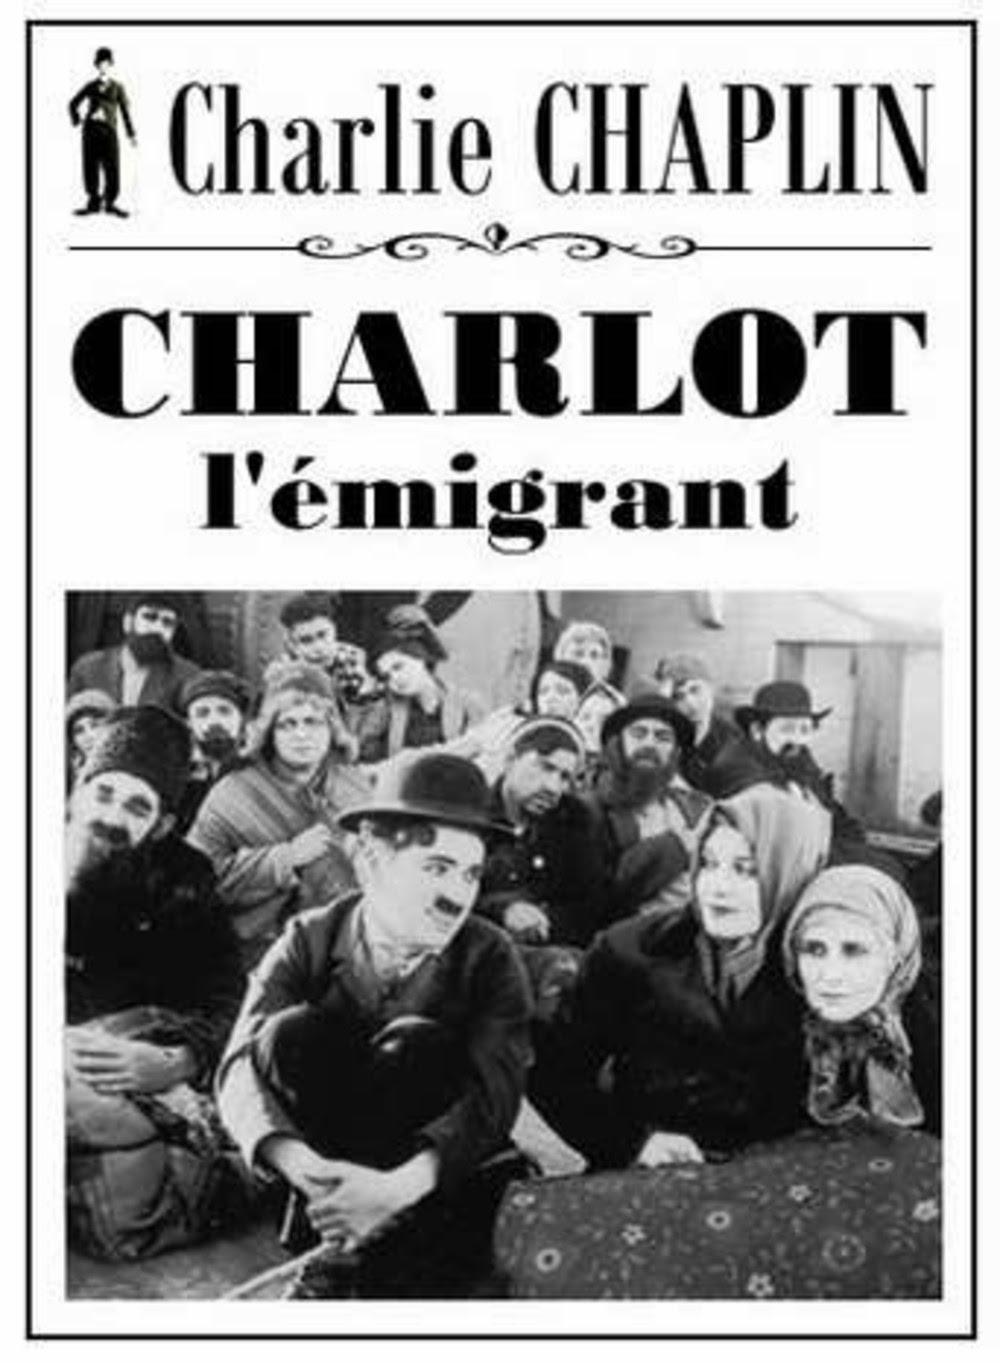 L'émigrantde Charlie Chaplin